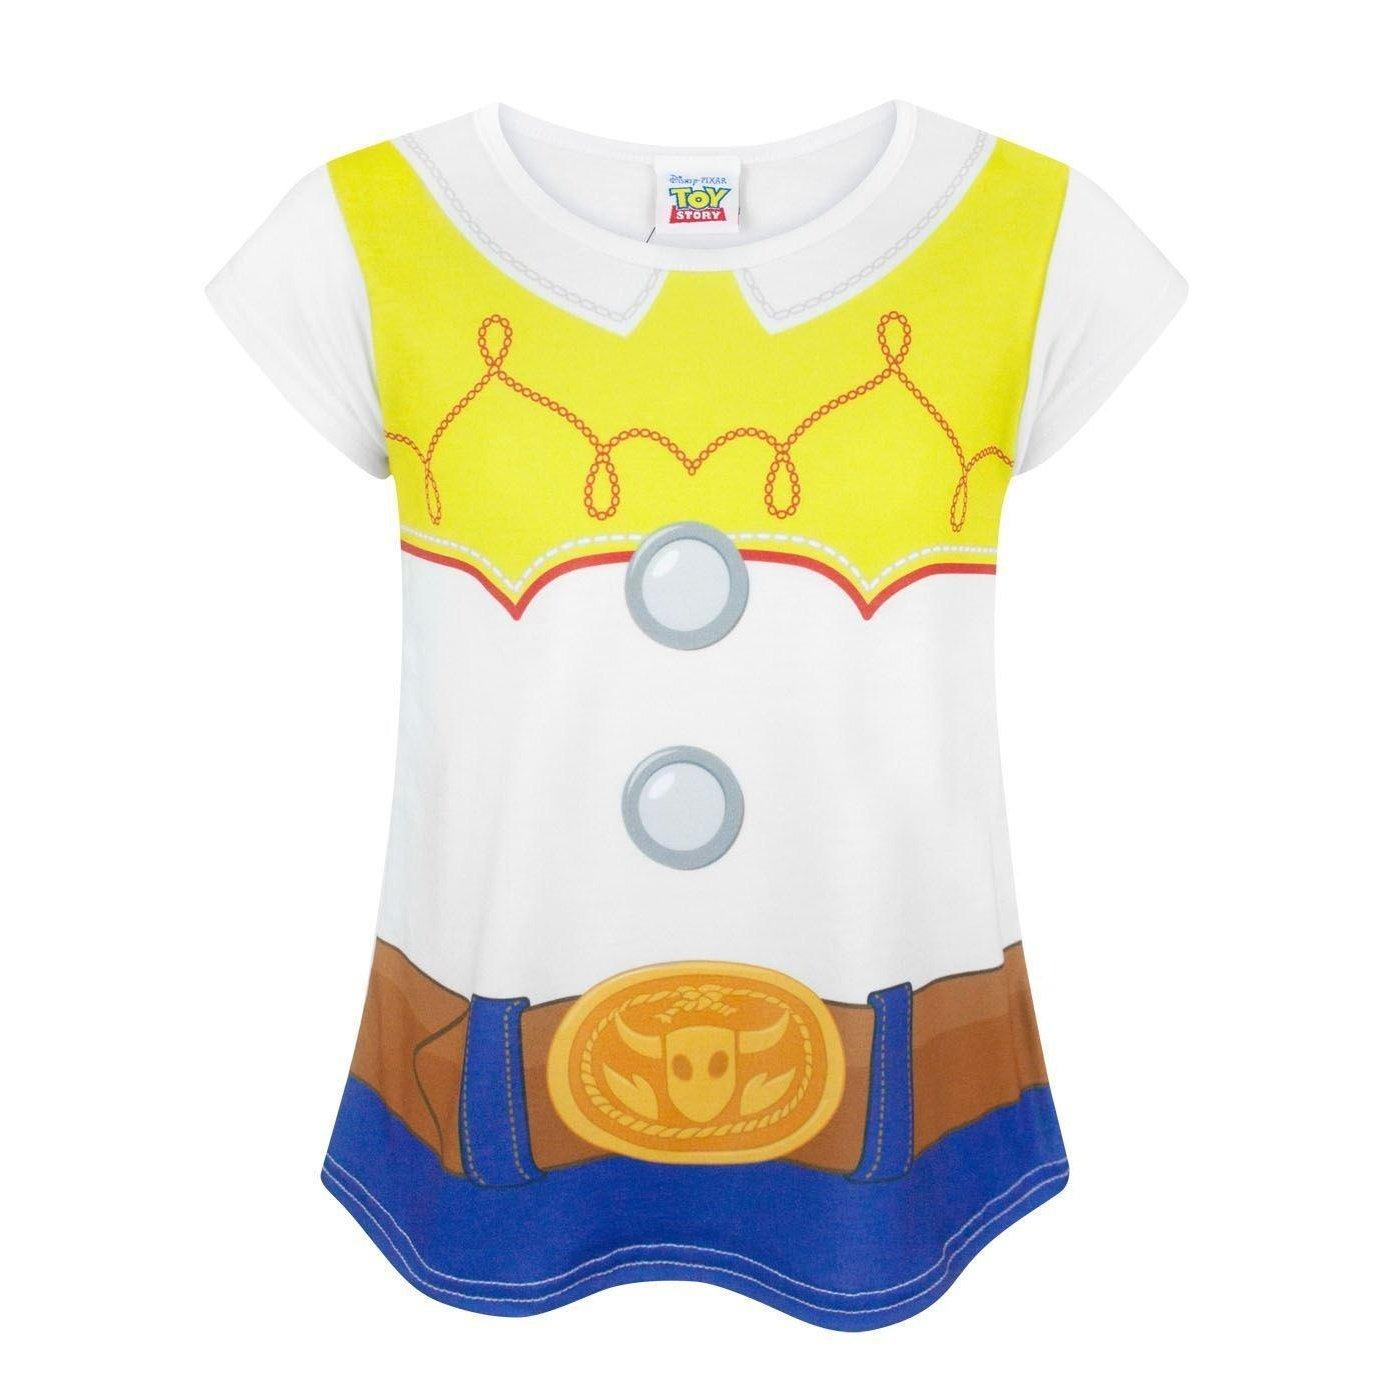 0763f5f12e96 Amazon.com  Disney Toy Story Jessie Costume Girl s T-Shirt  Clothing